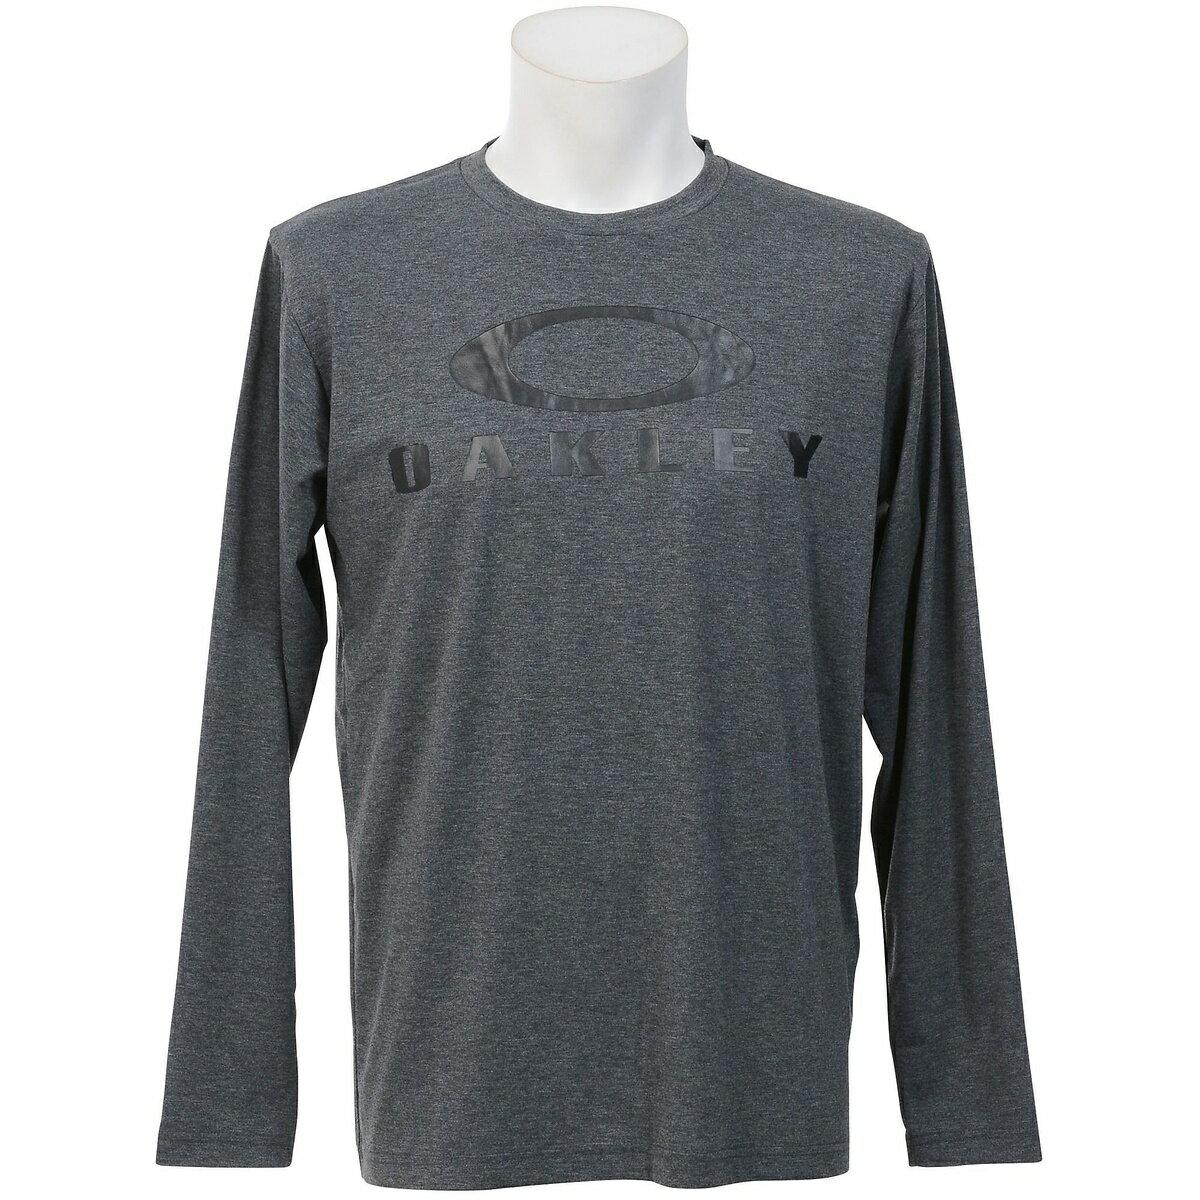 ● OAKLEY(オークリー) メンズスポーツウェア 長袖機能Tシャツ ENHANCE TECHNICAL QD LS TEE.17F.07 メンズ DARK HEATHER GREY 456911JP-20Q